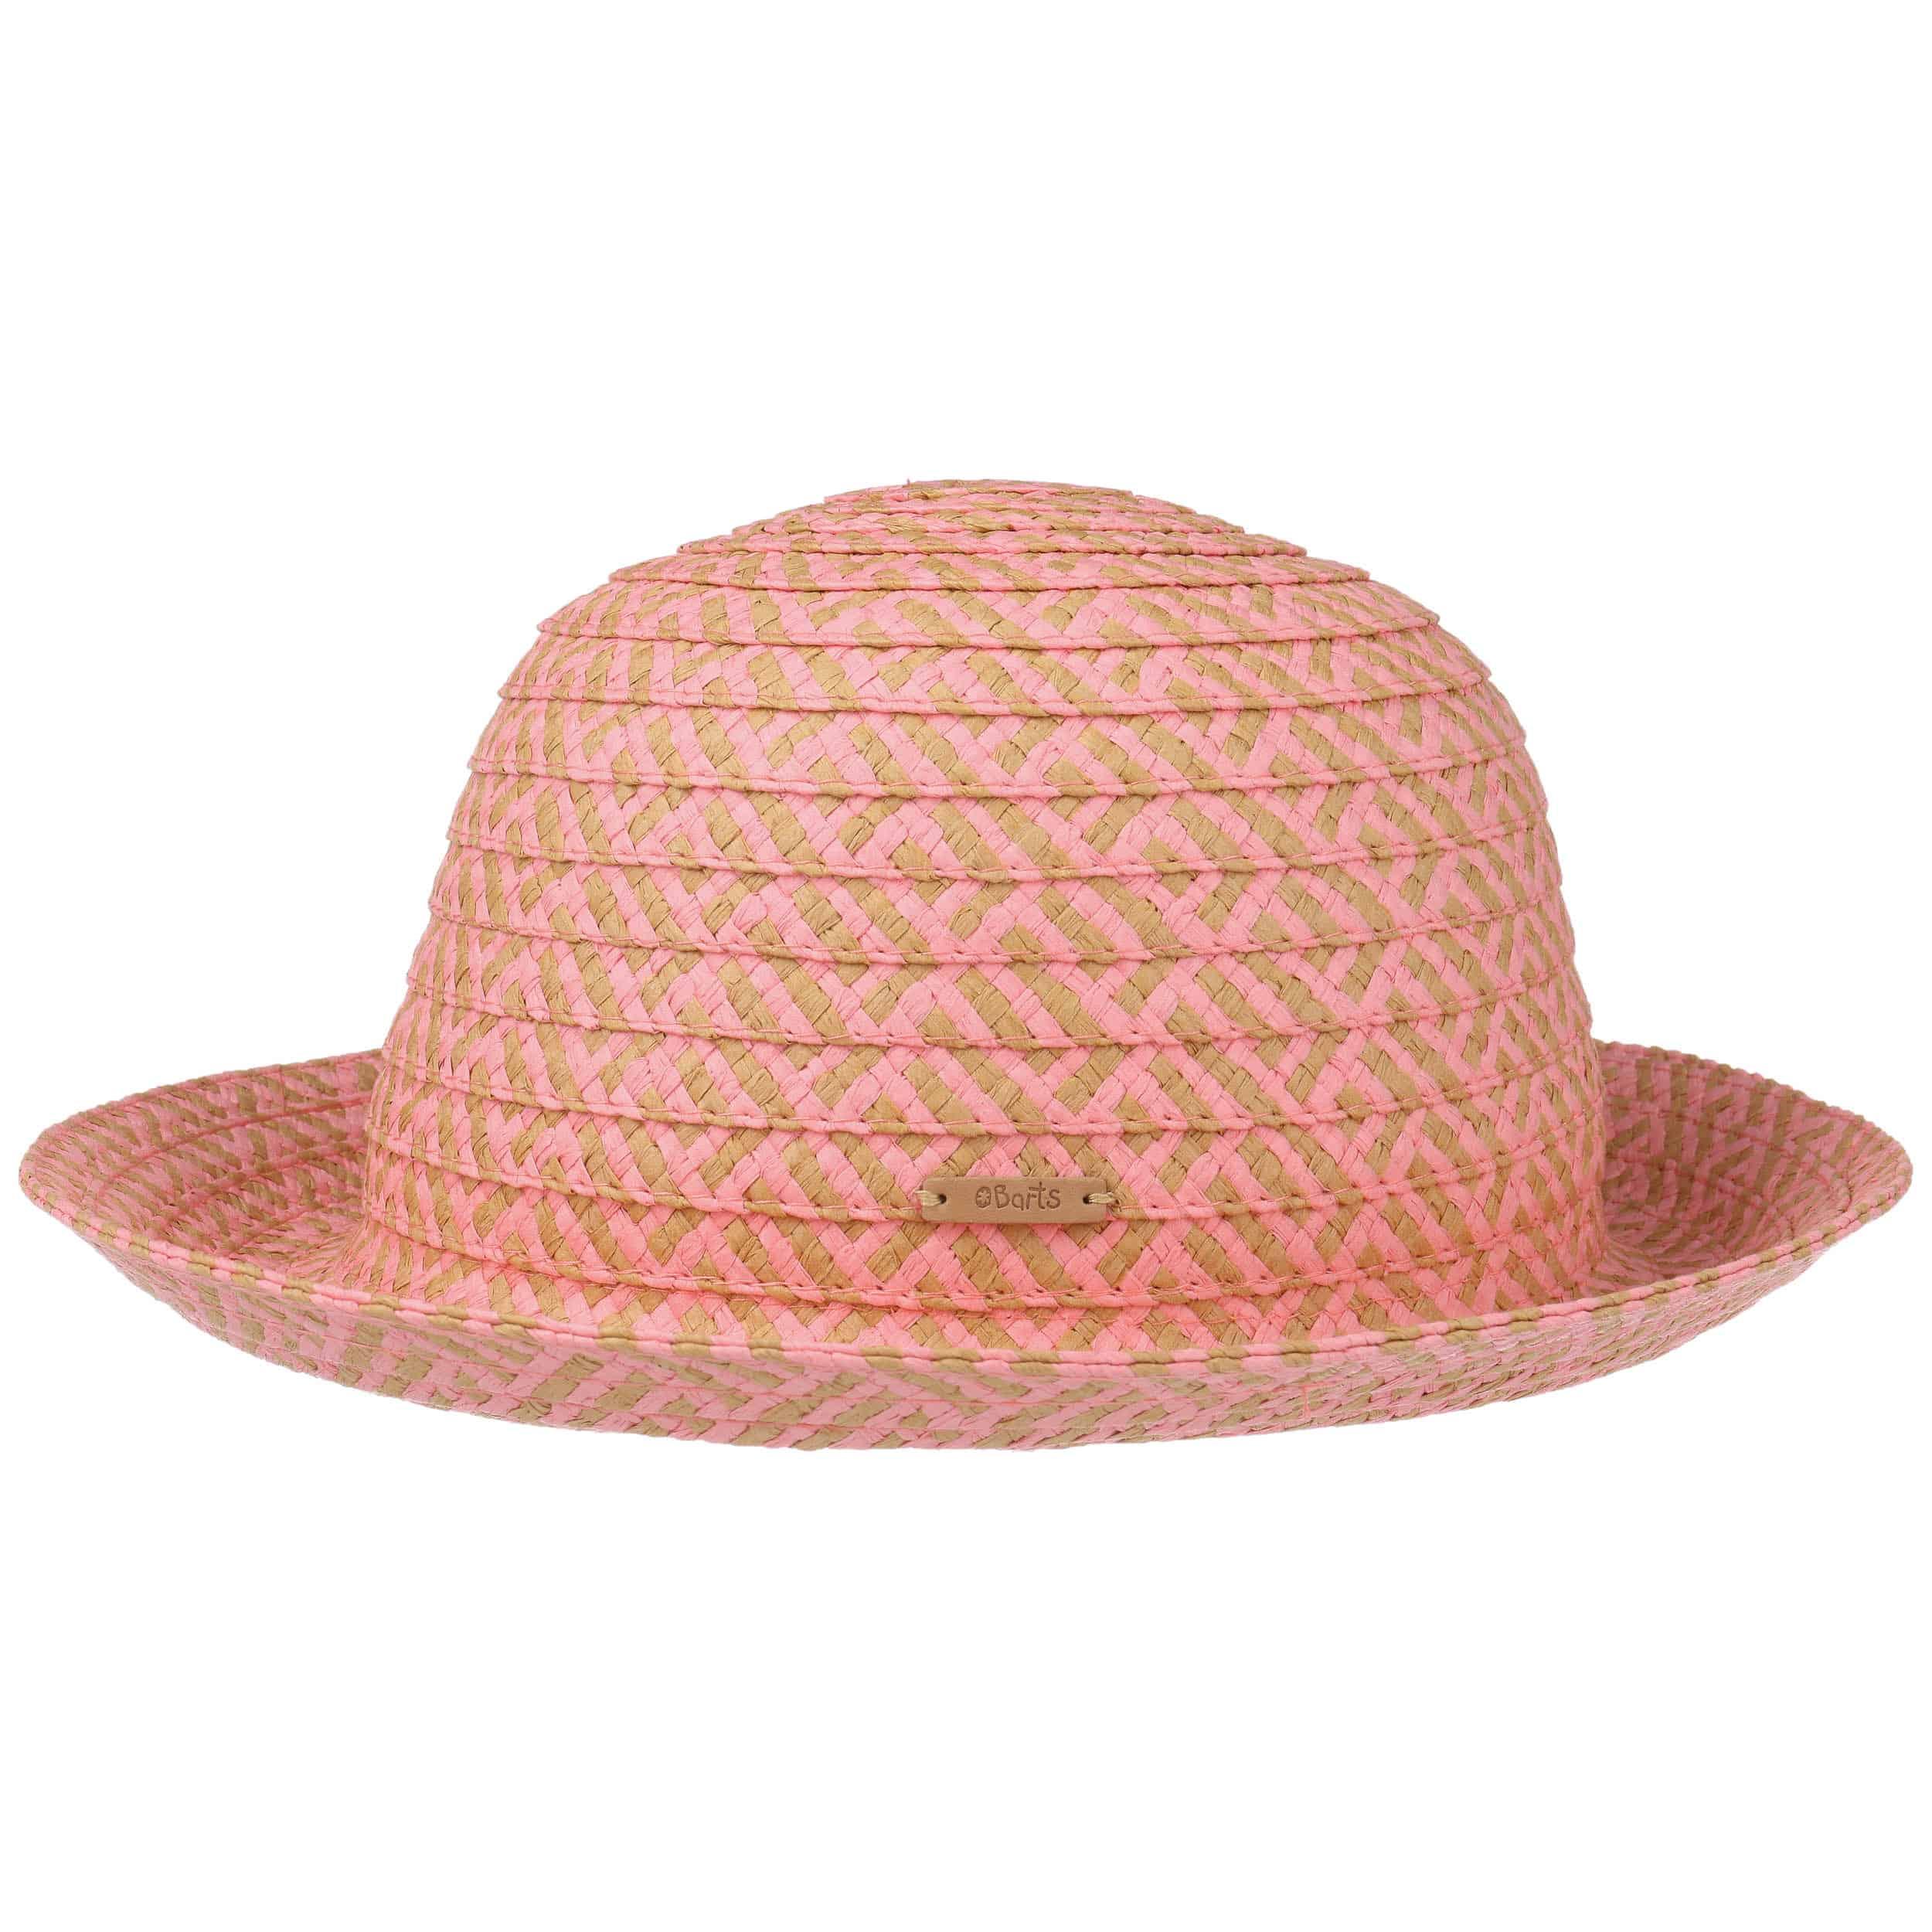 cac6f3f410c ... Havana Girls Summer Hat by Barts - rose 5 ...